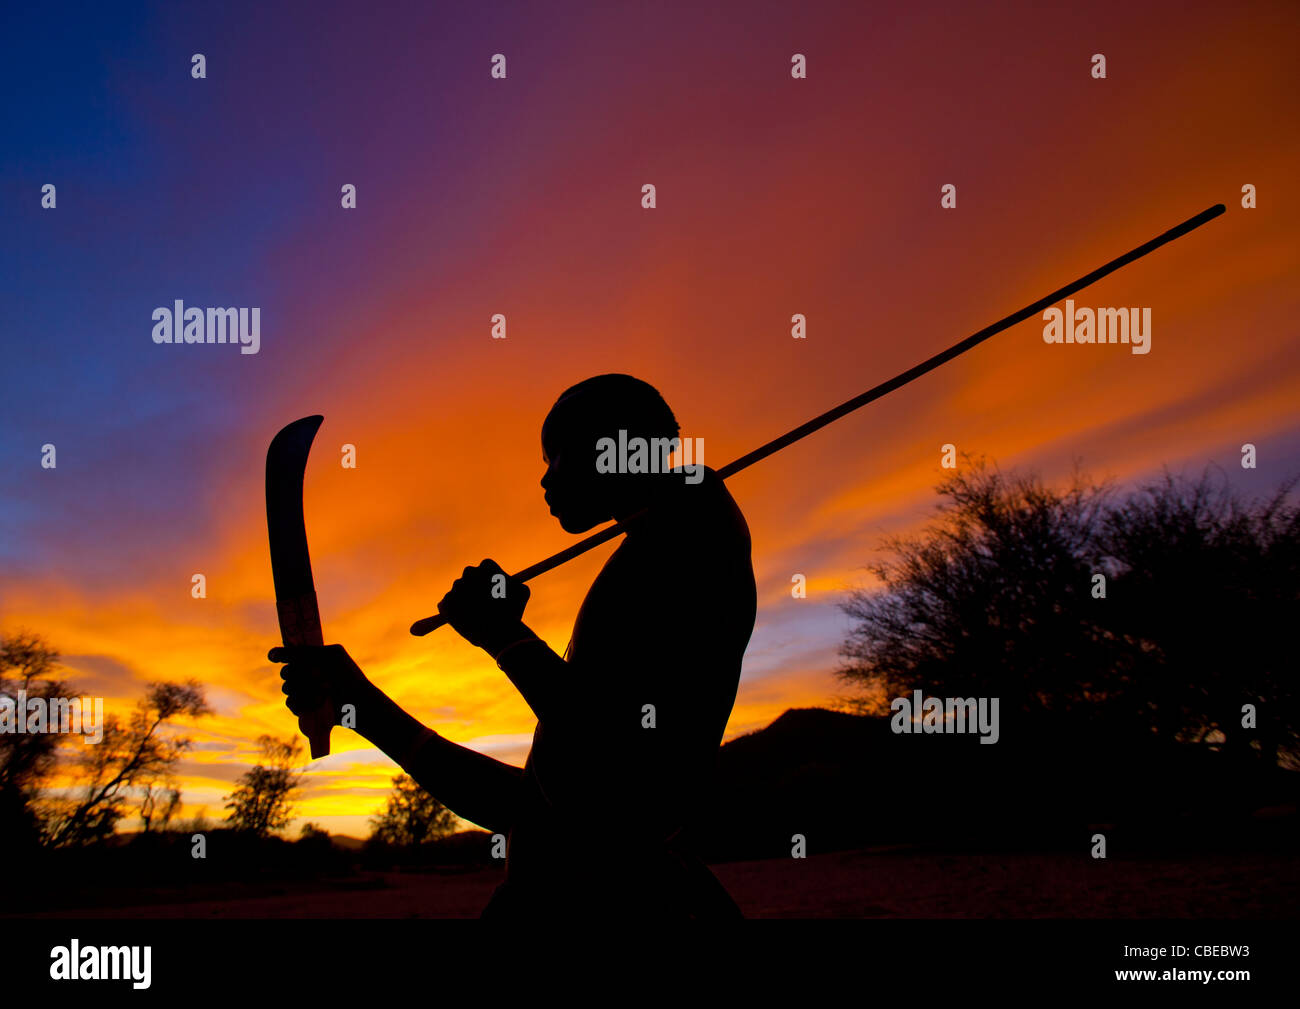 Mucubal Boy With Omotungo Knife At Sunset, Virie Area, Angola - Stock Image